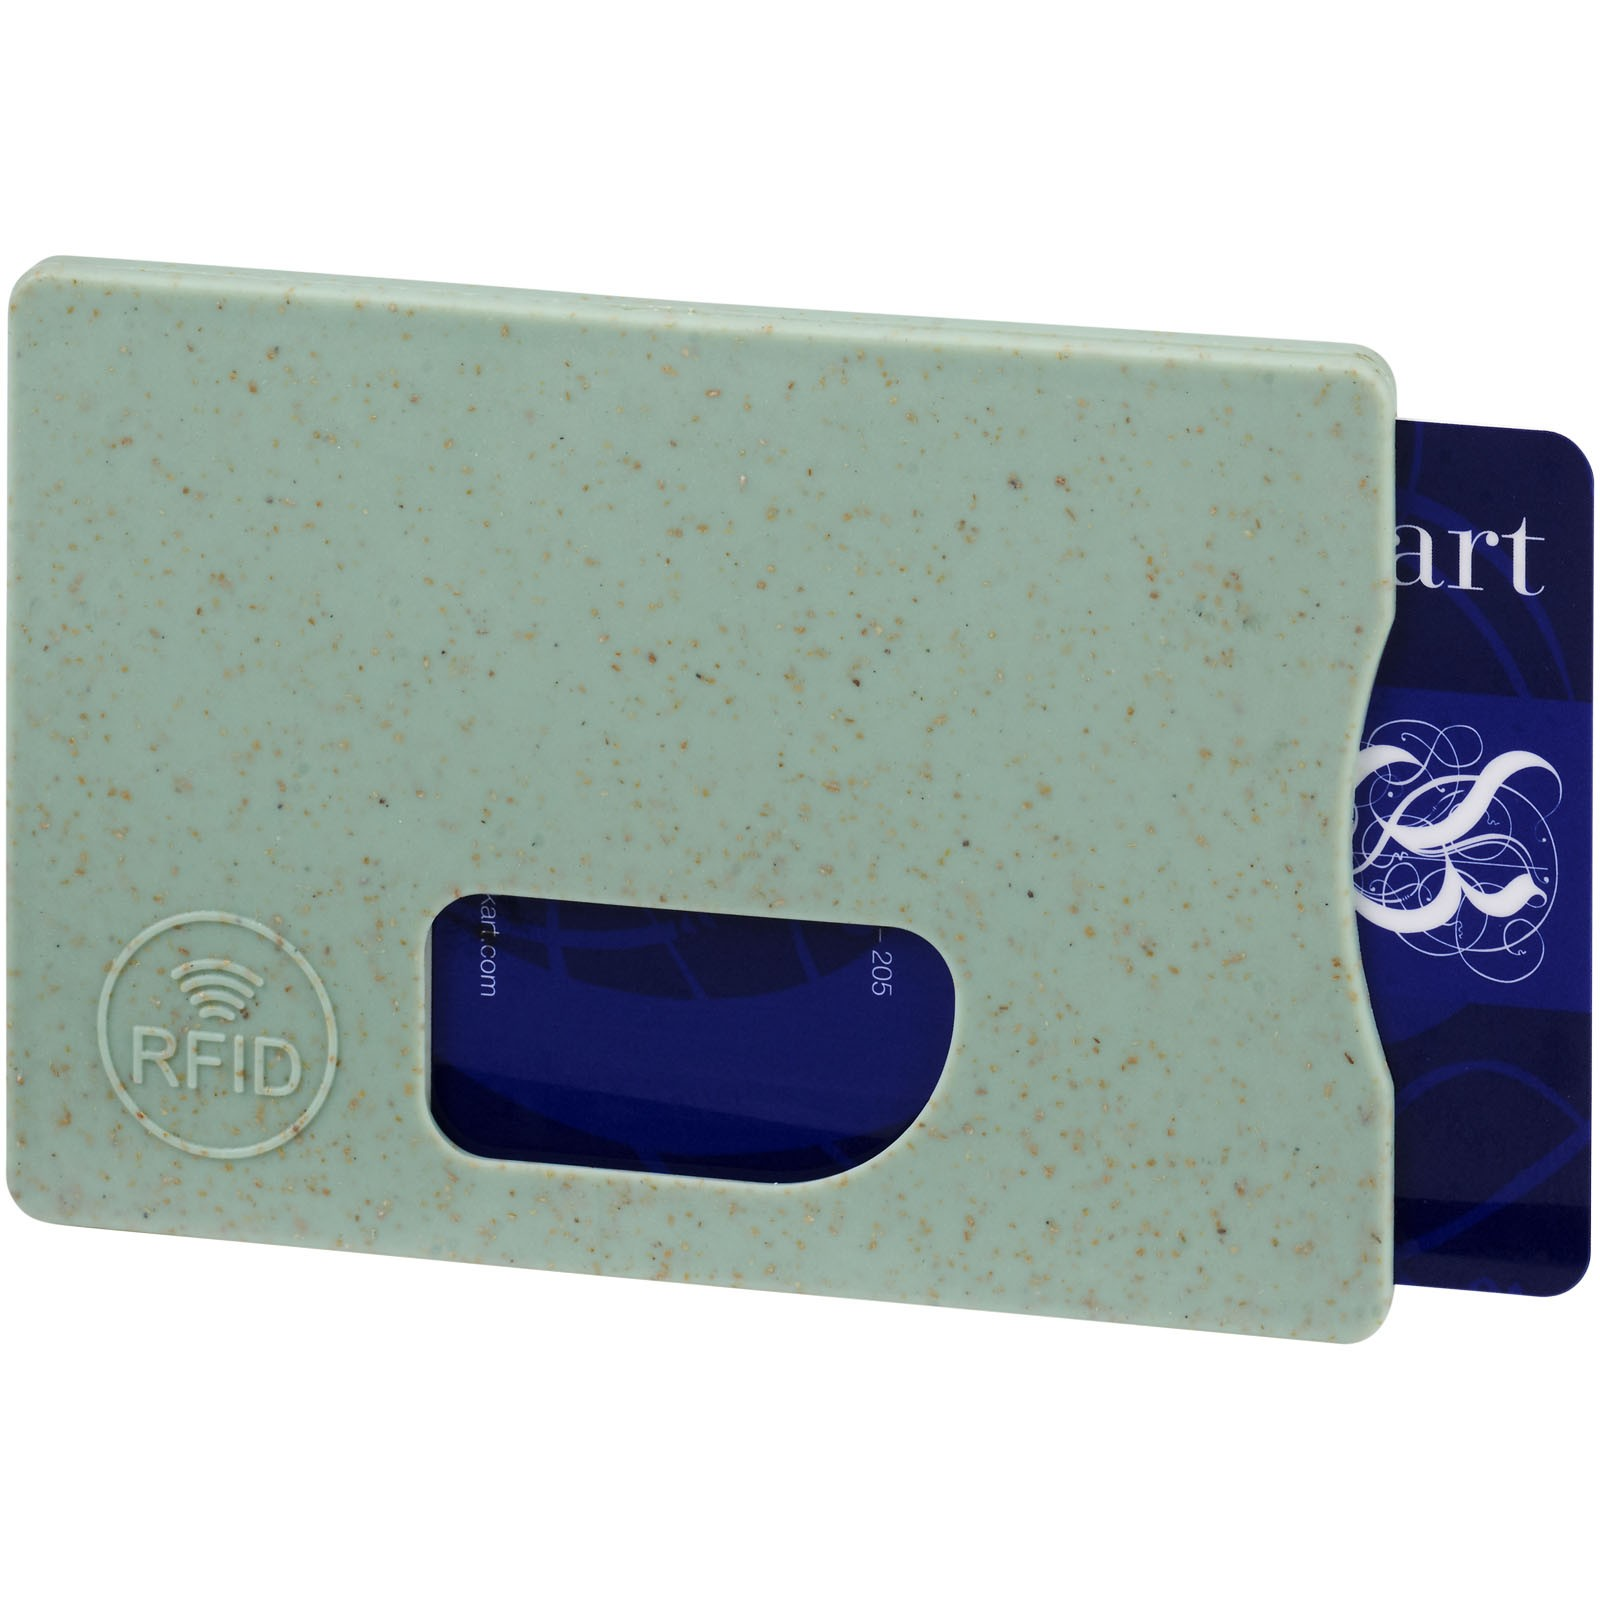 Straw RFID card holder - Mint